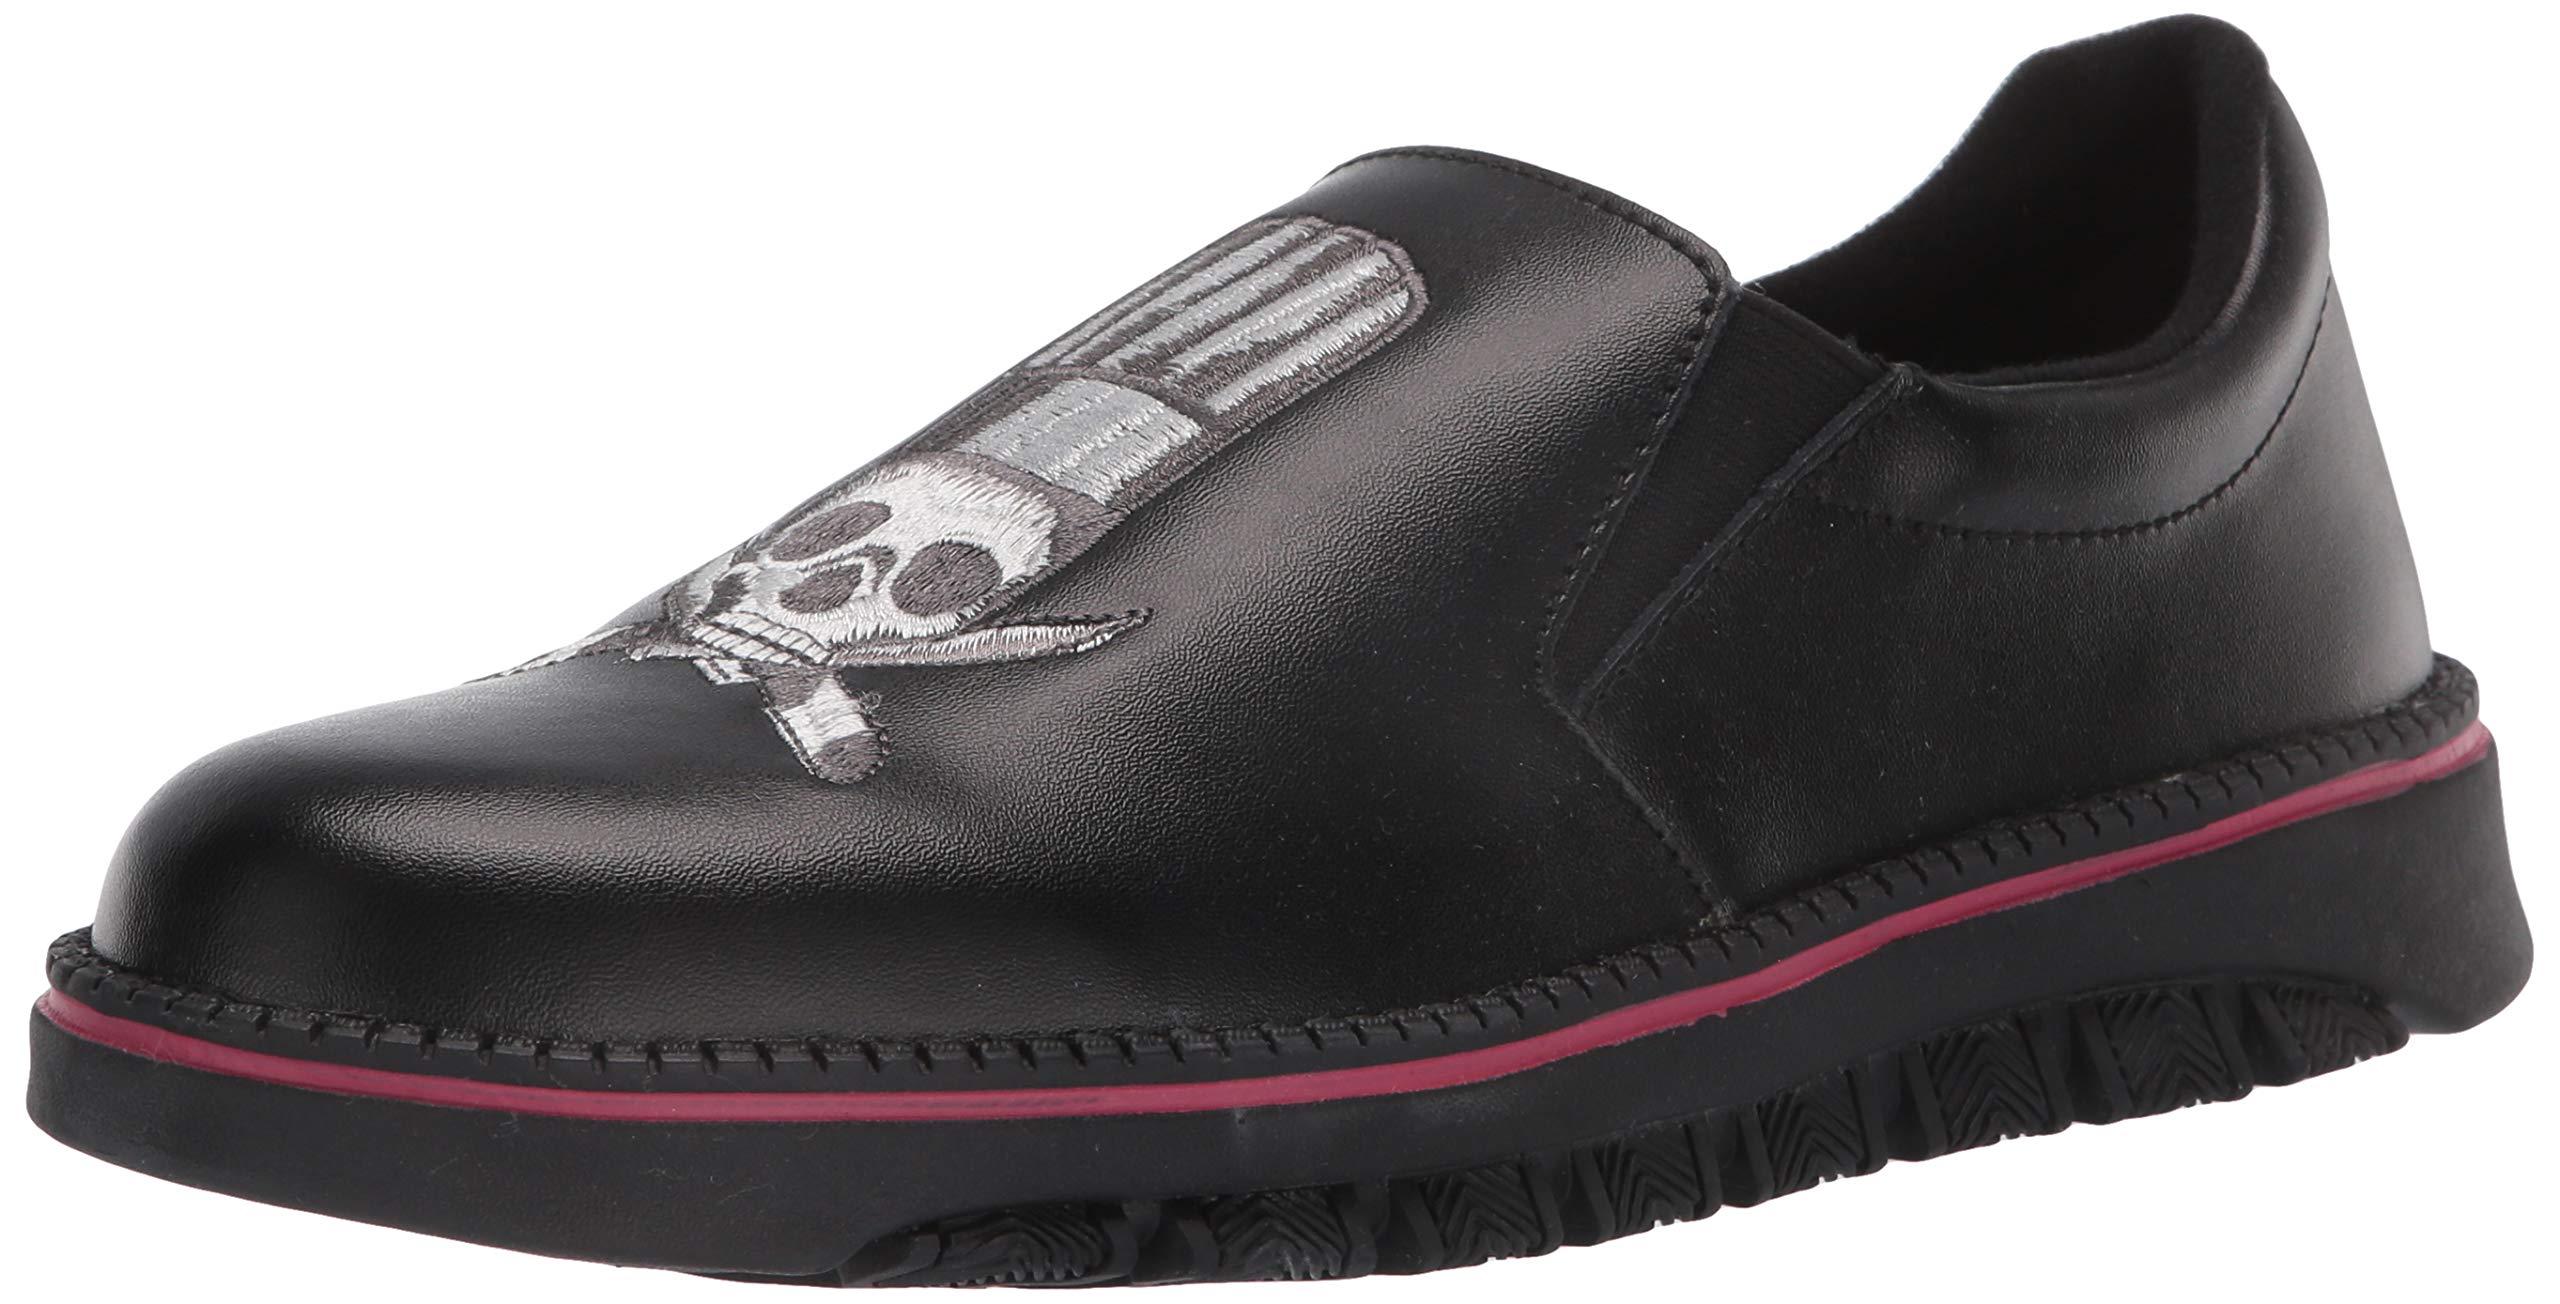 Spring Step Professional Women's Power-Knives Uniform Dress Shoe